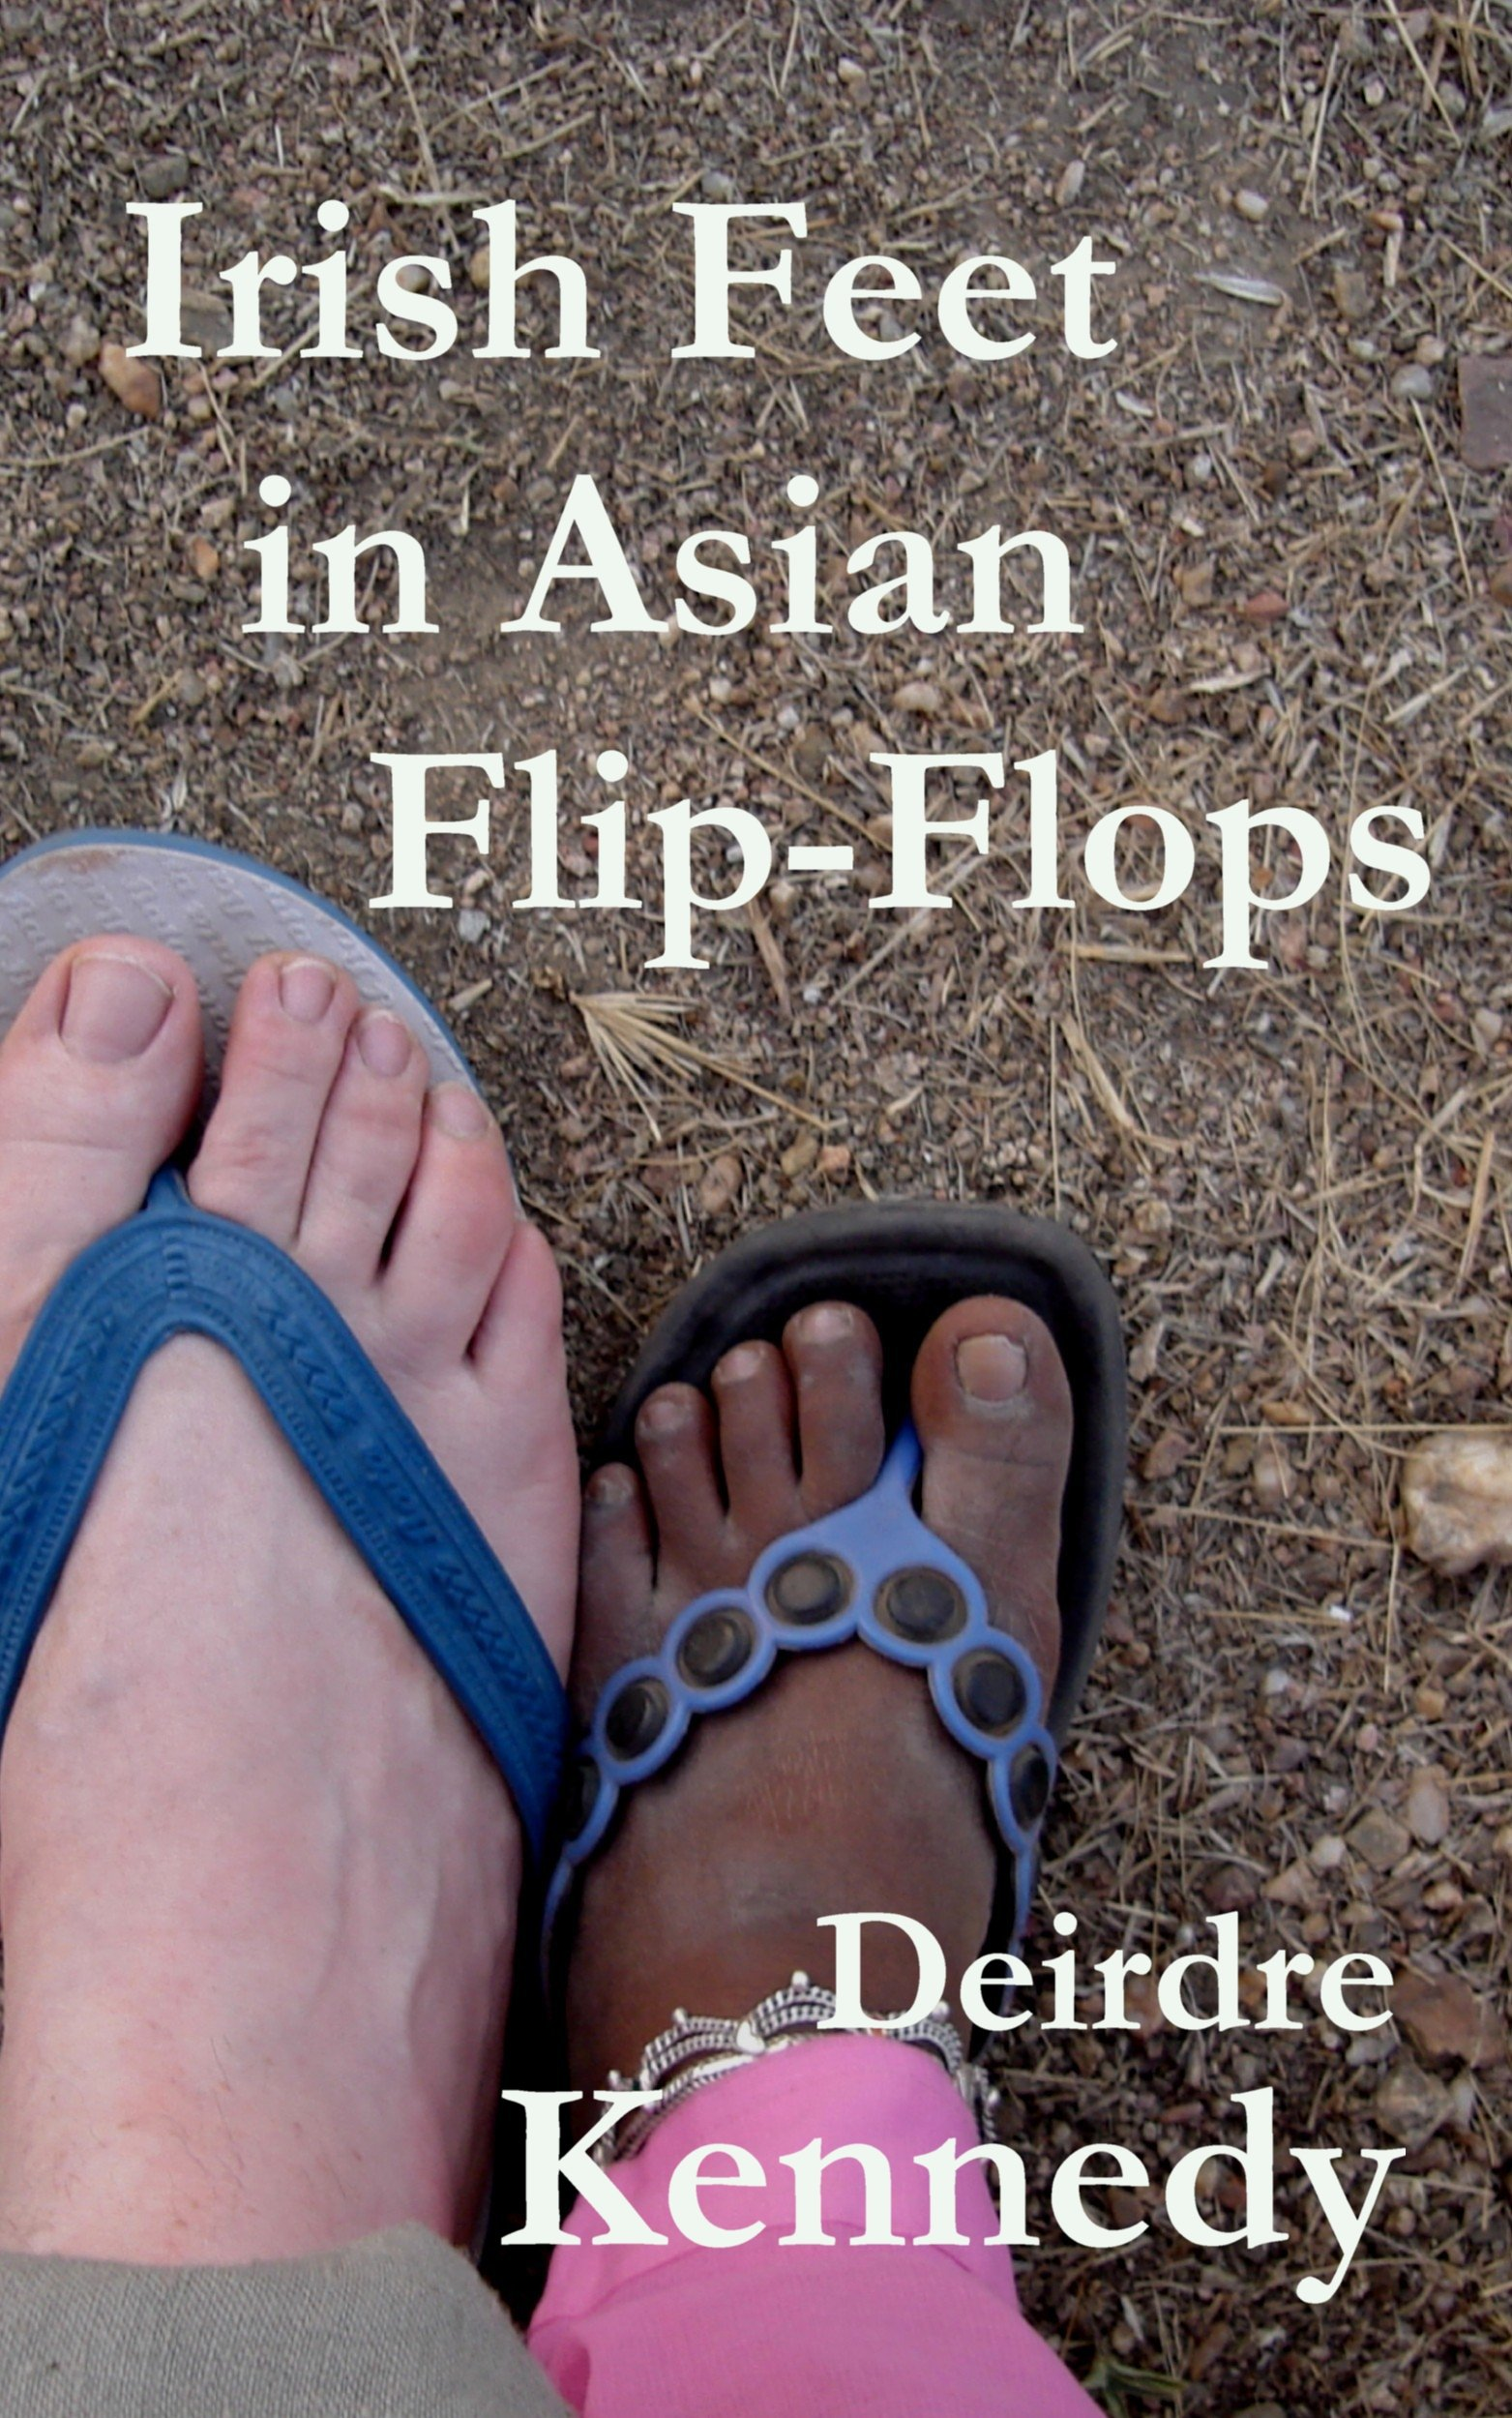 Irish Feet in Asian Flip-Flop